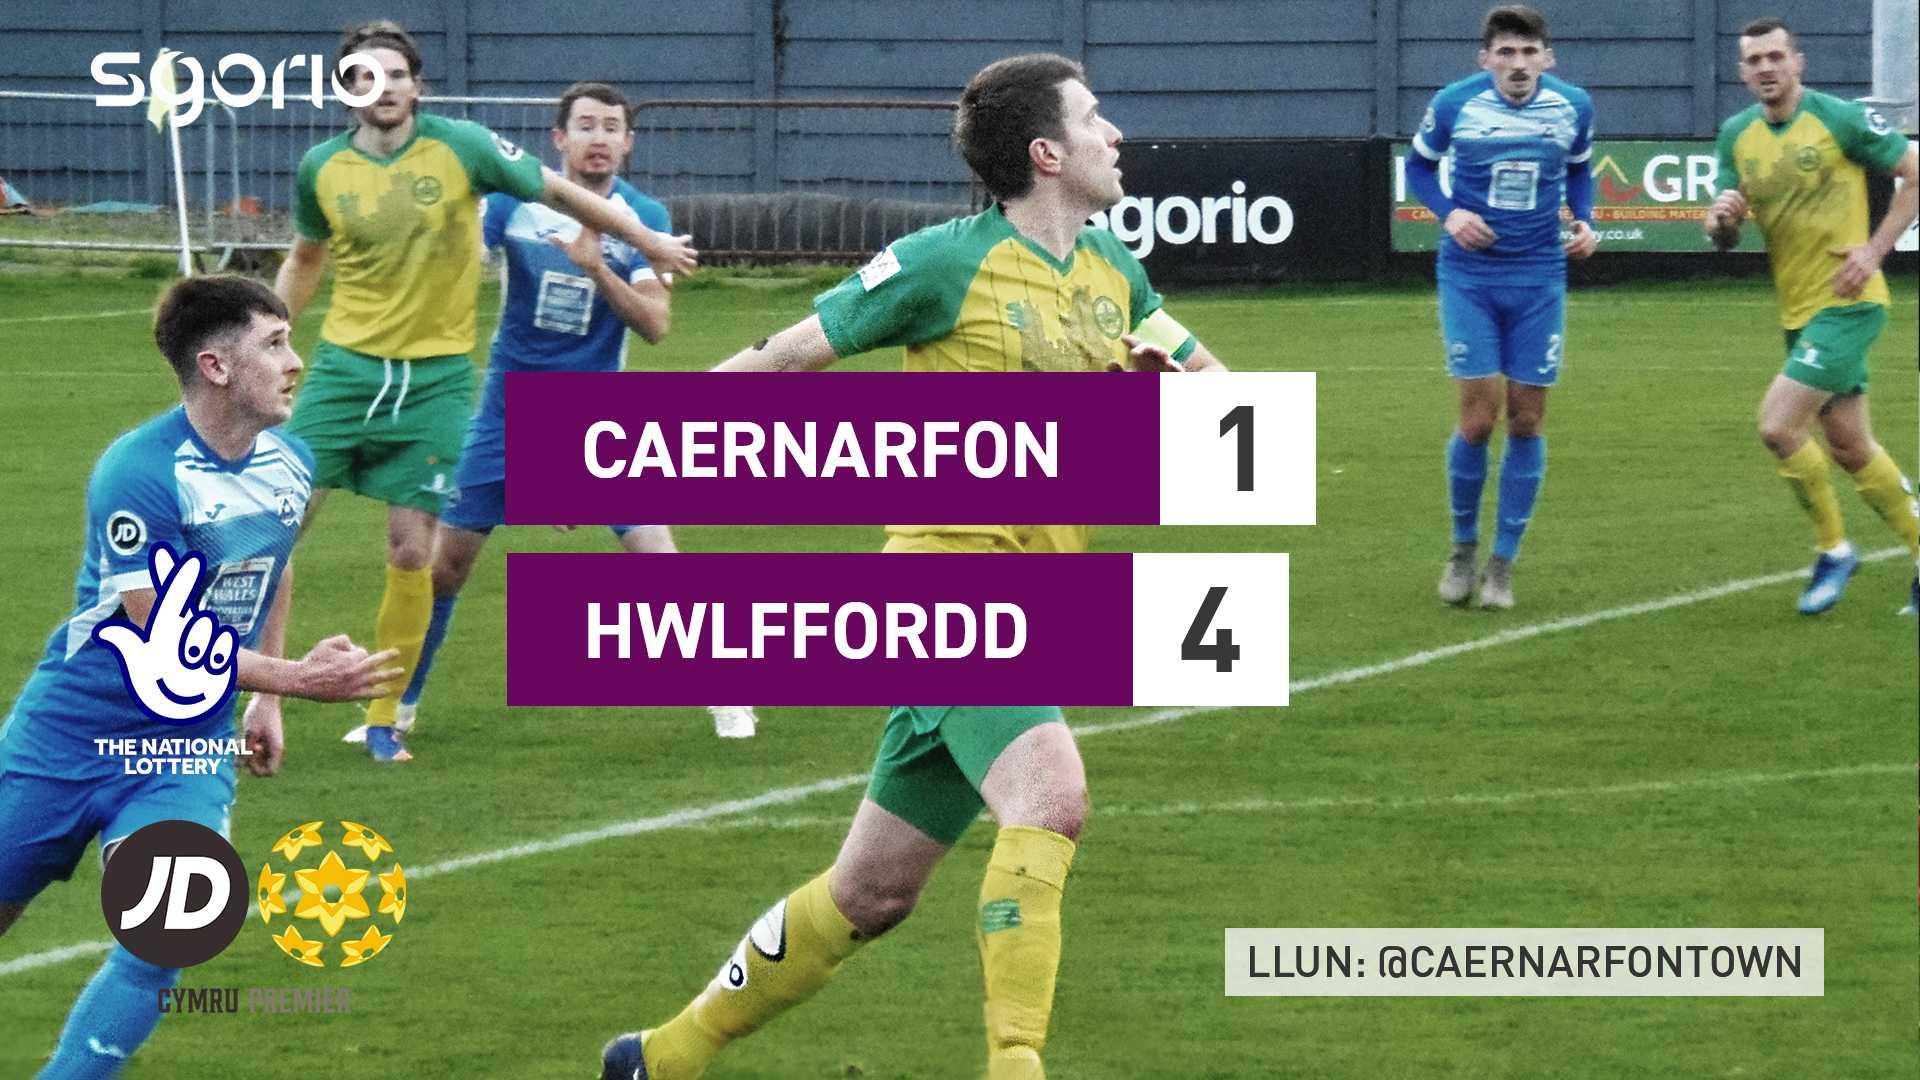 Caernarfon 1-4 Haverfordwest County